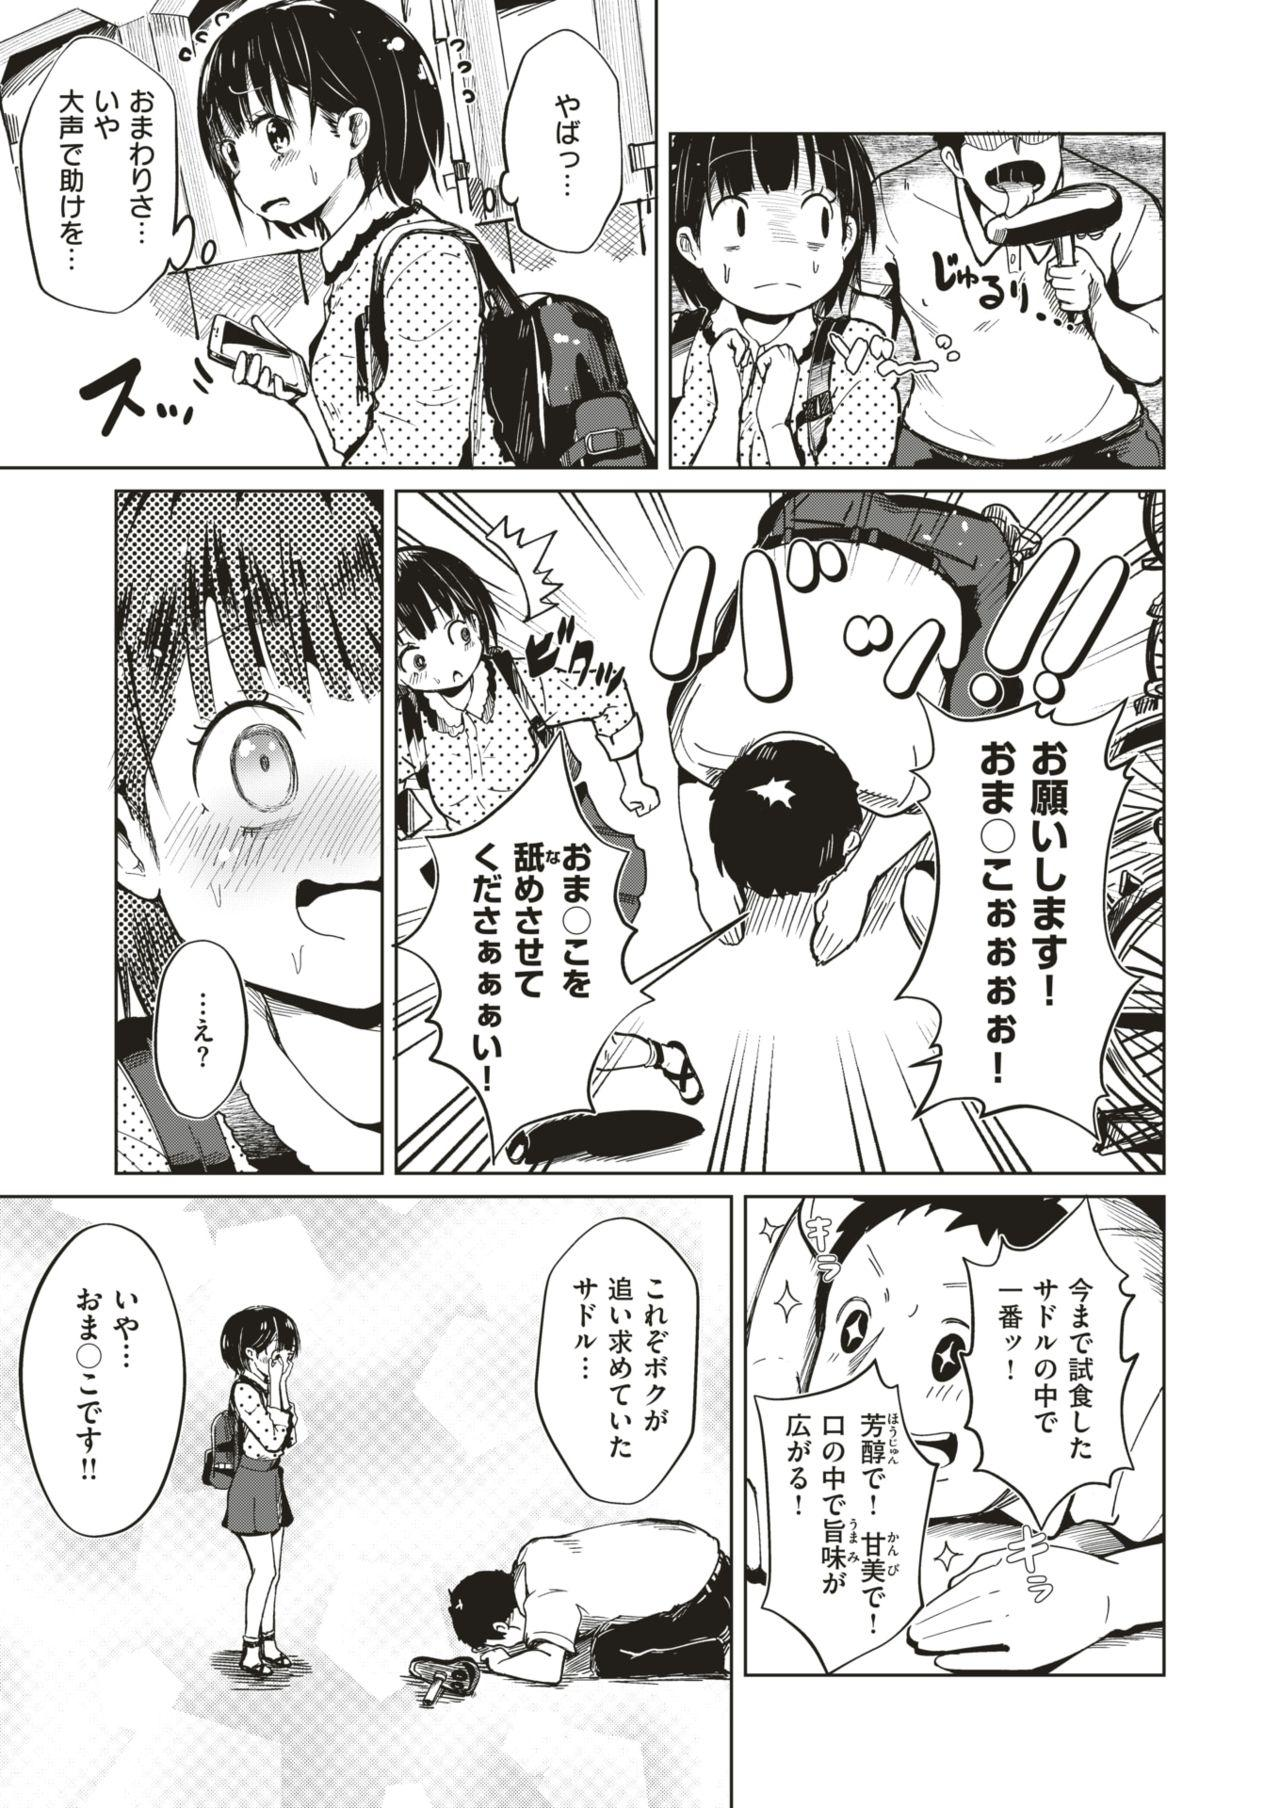 COMIC HAPPINING Vol. 4 105